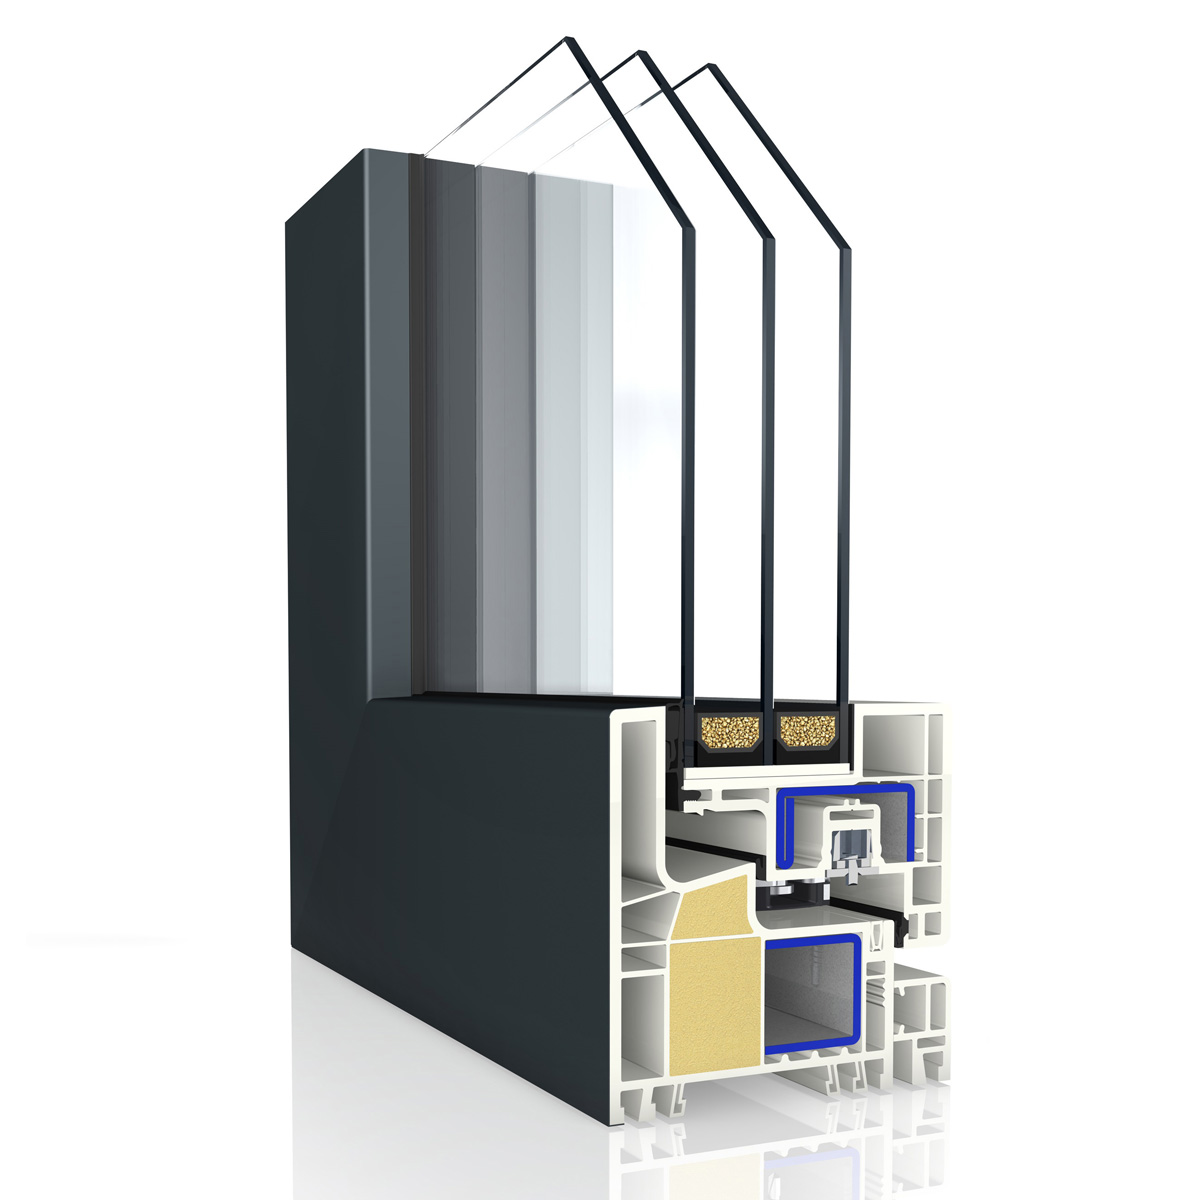 atemberaubend kunststoff fensterrahmen ideen bilderrahmen ideen. Black Bedroom Furniture Sets. Home Design Ideas